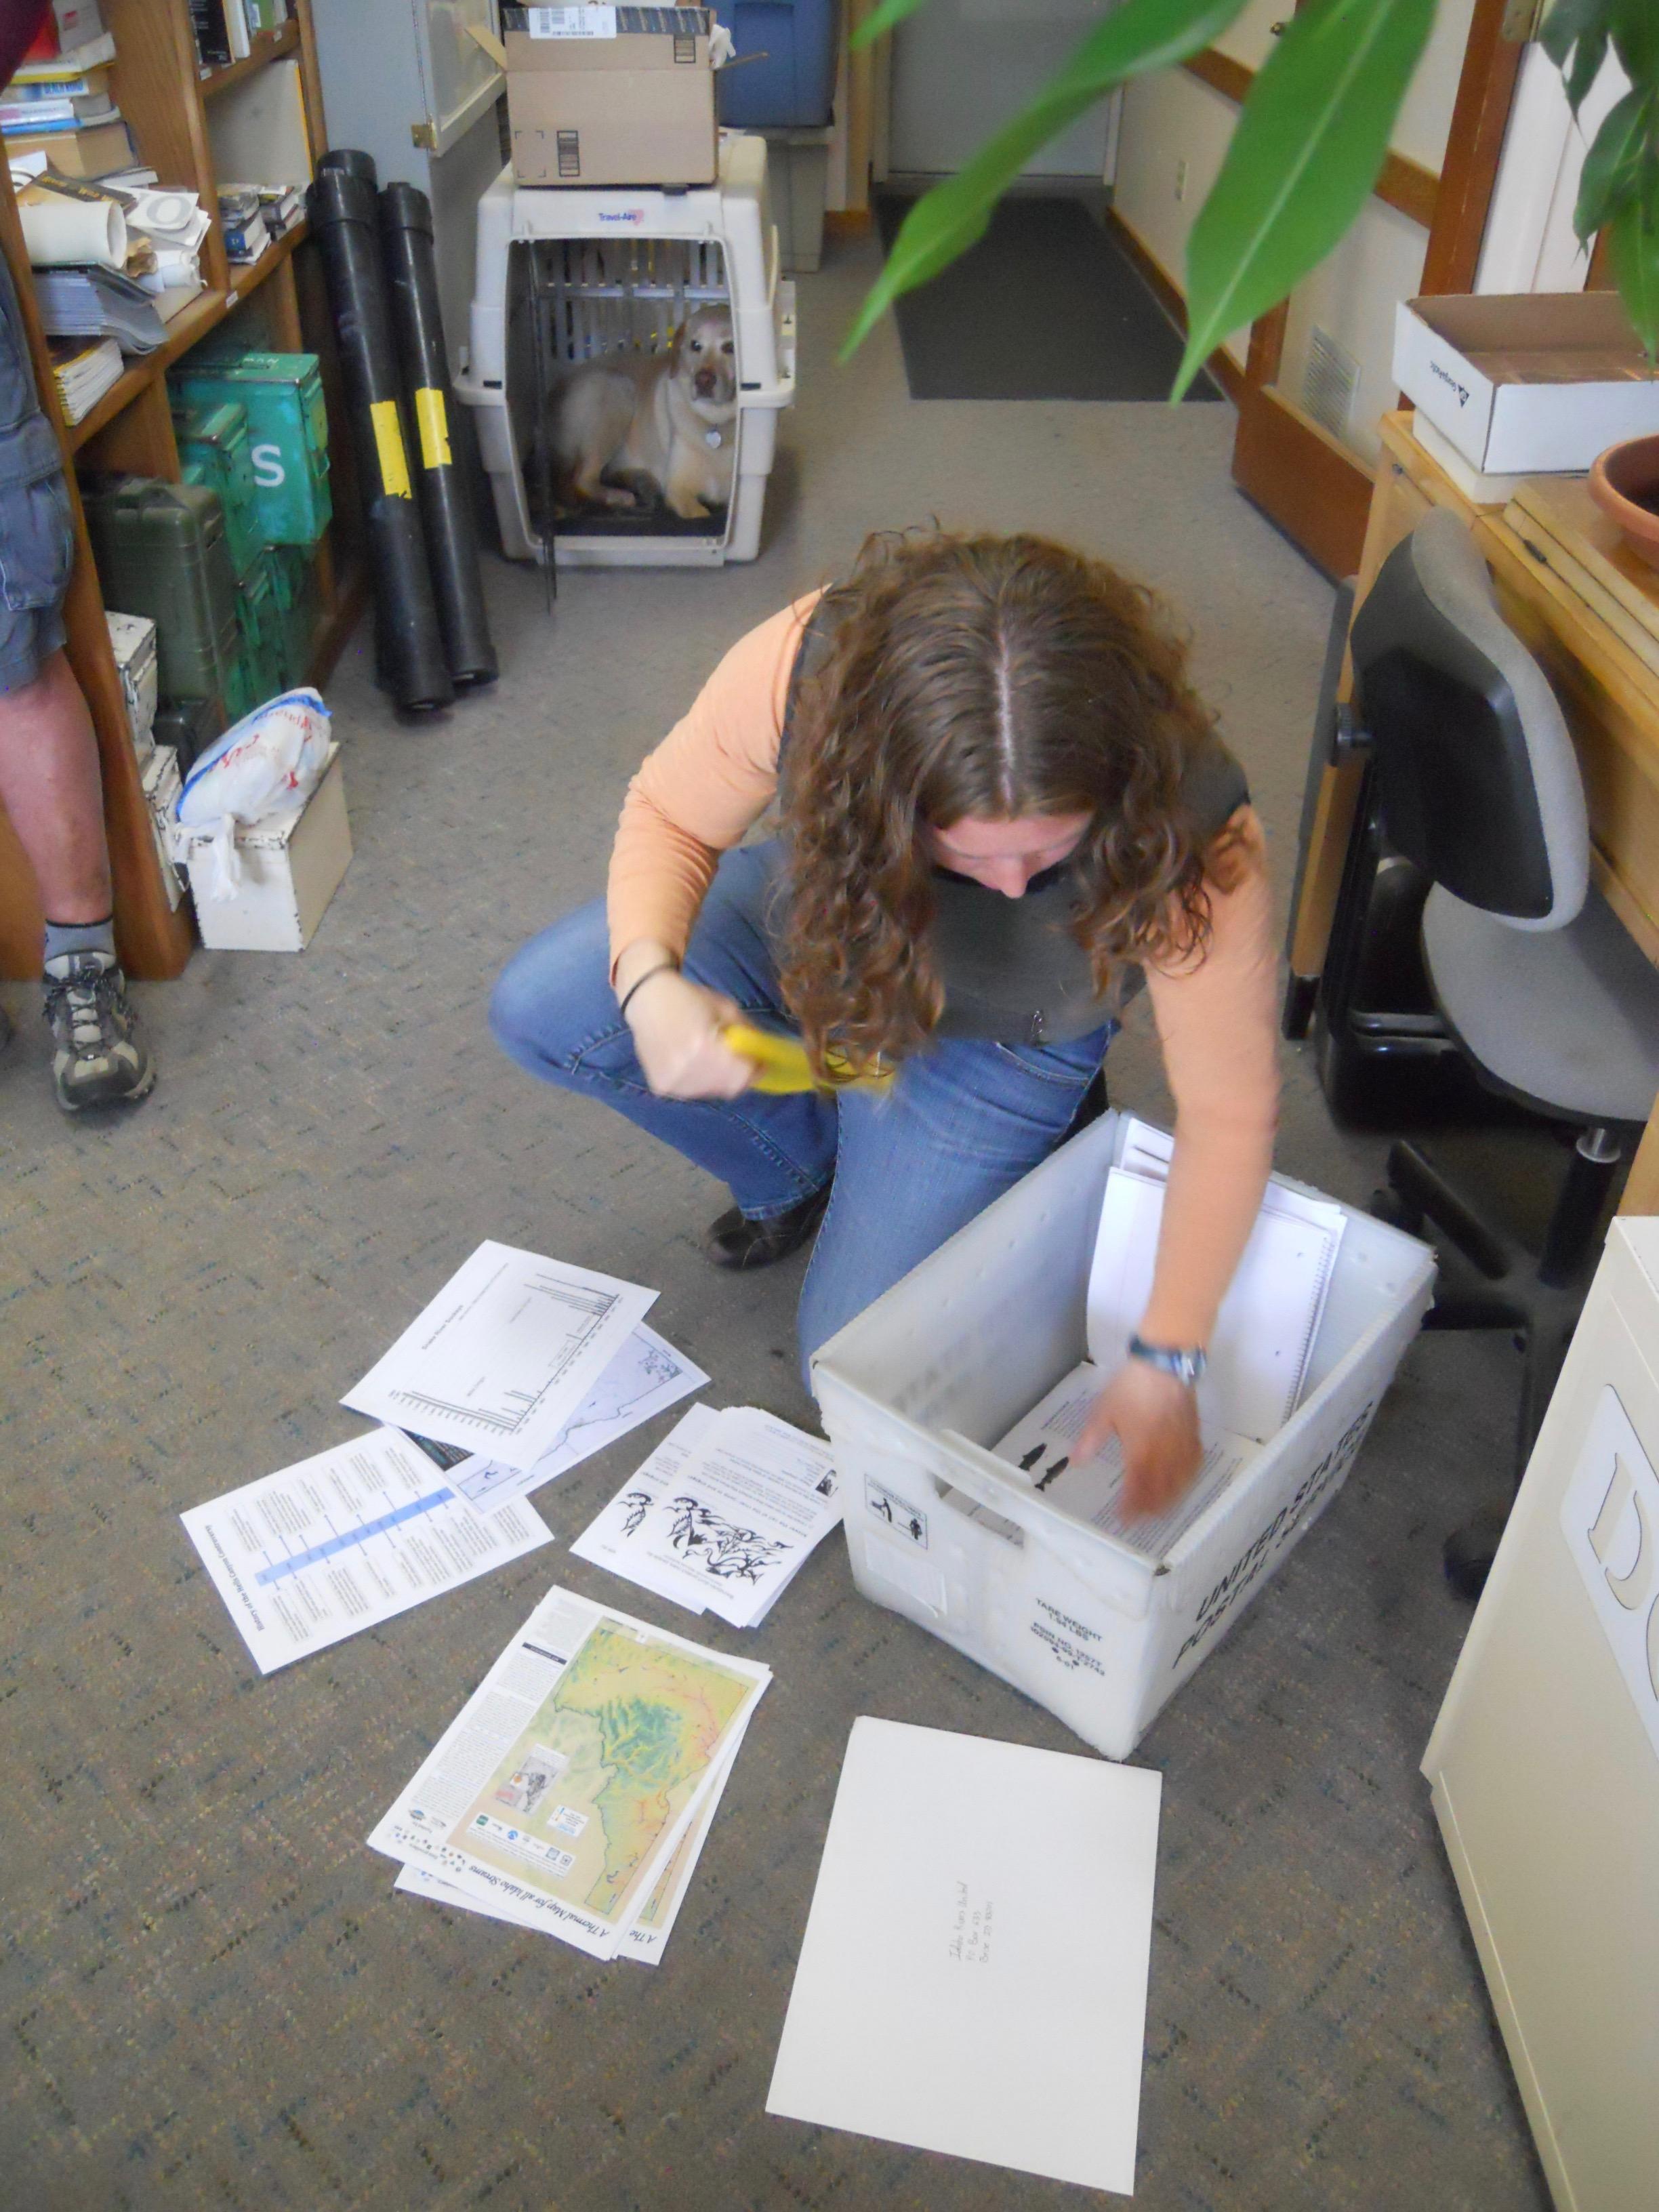 Natalie Shellworth prepares materials for a presentation in north Idaho.